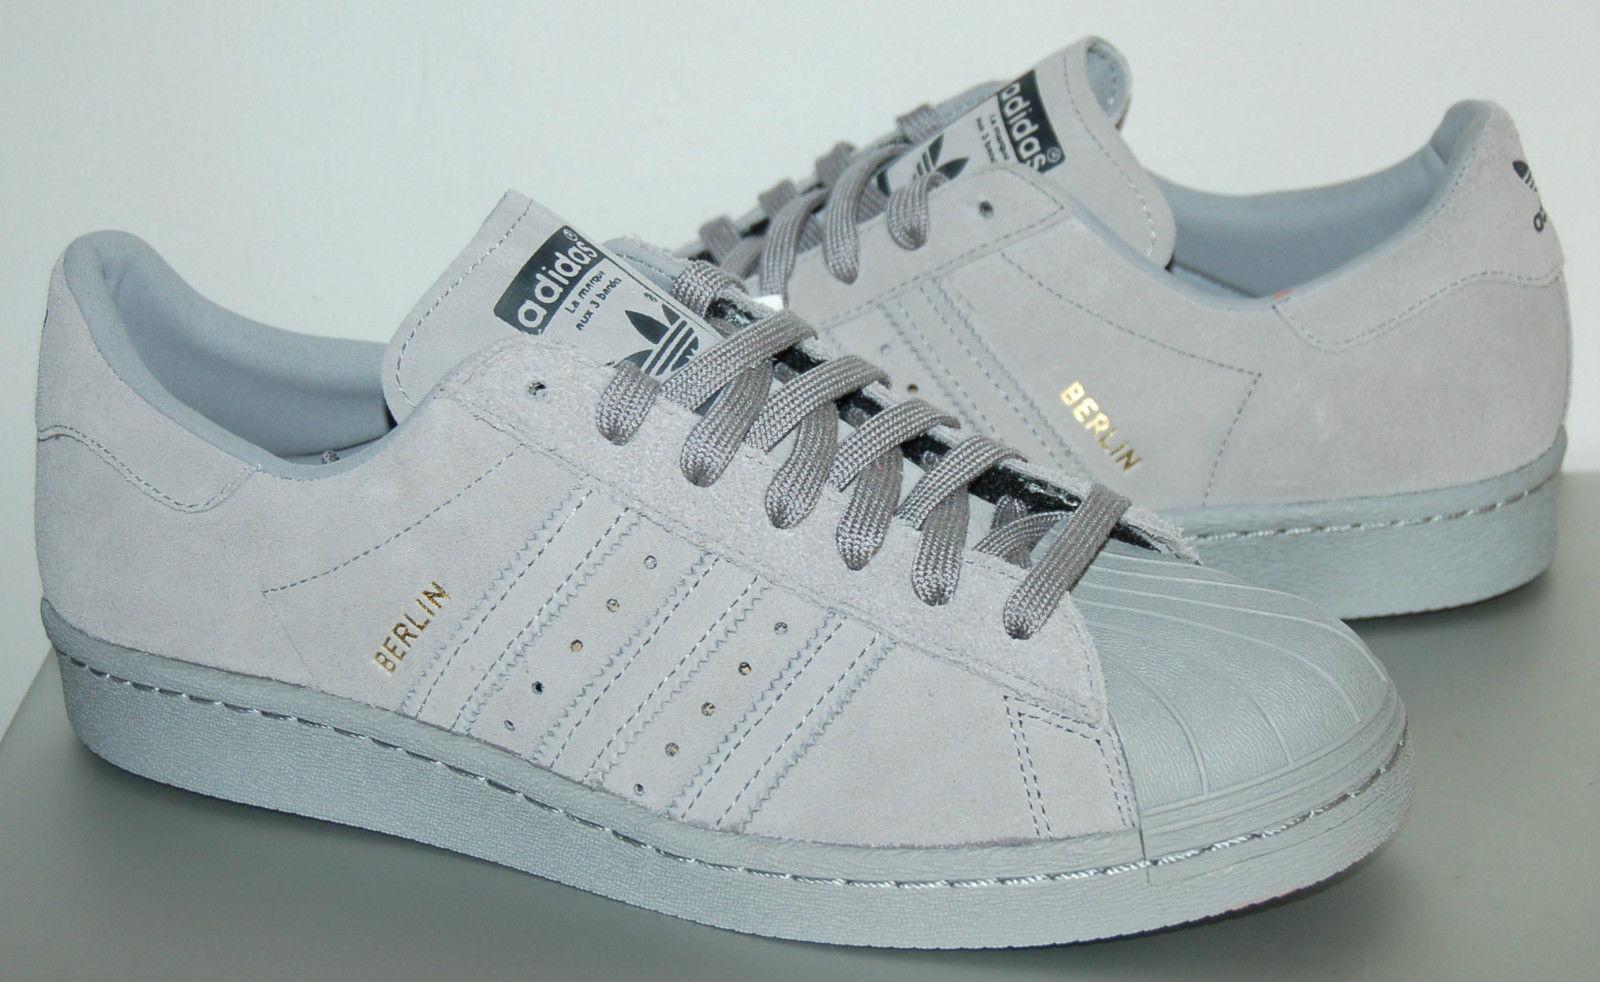 4cee4a2d130760 adidas superstar berlin prix htqtal